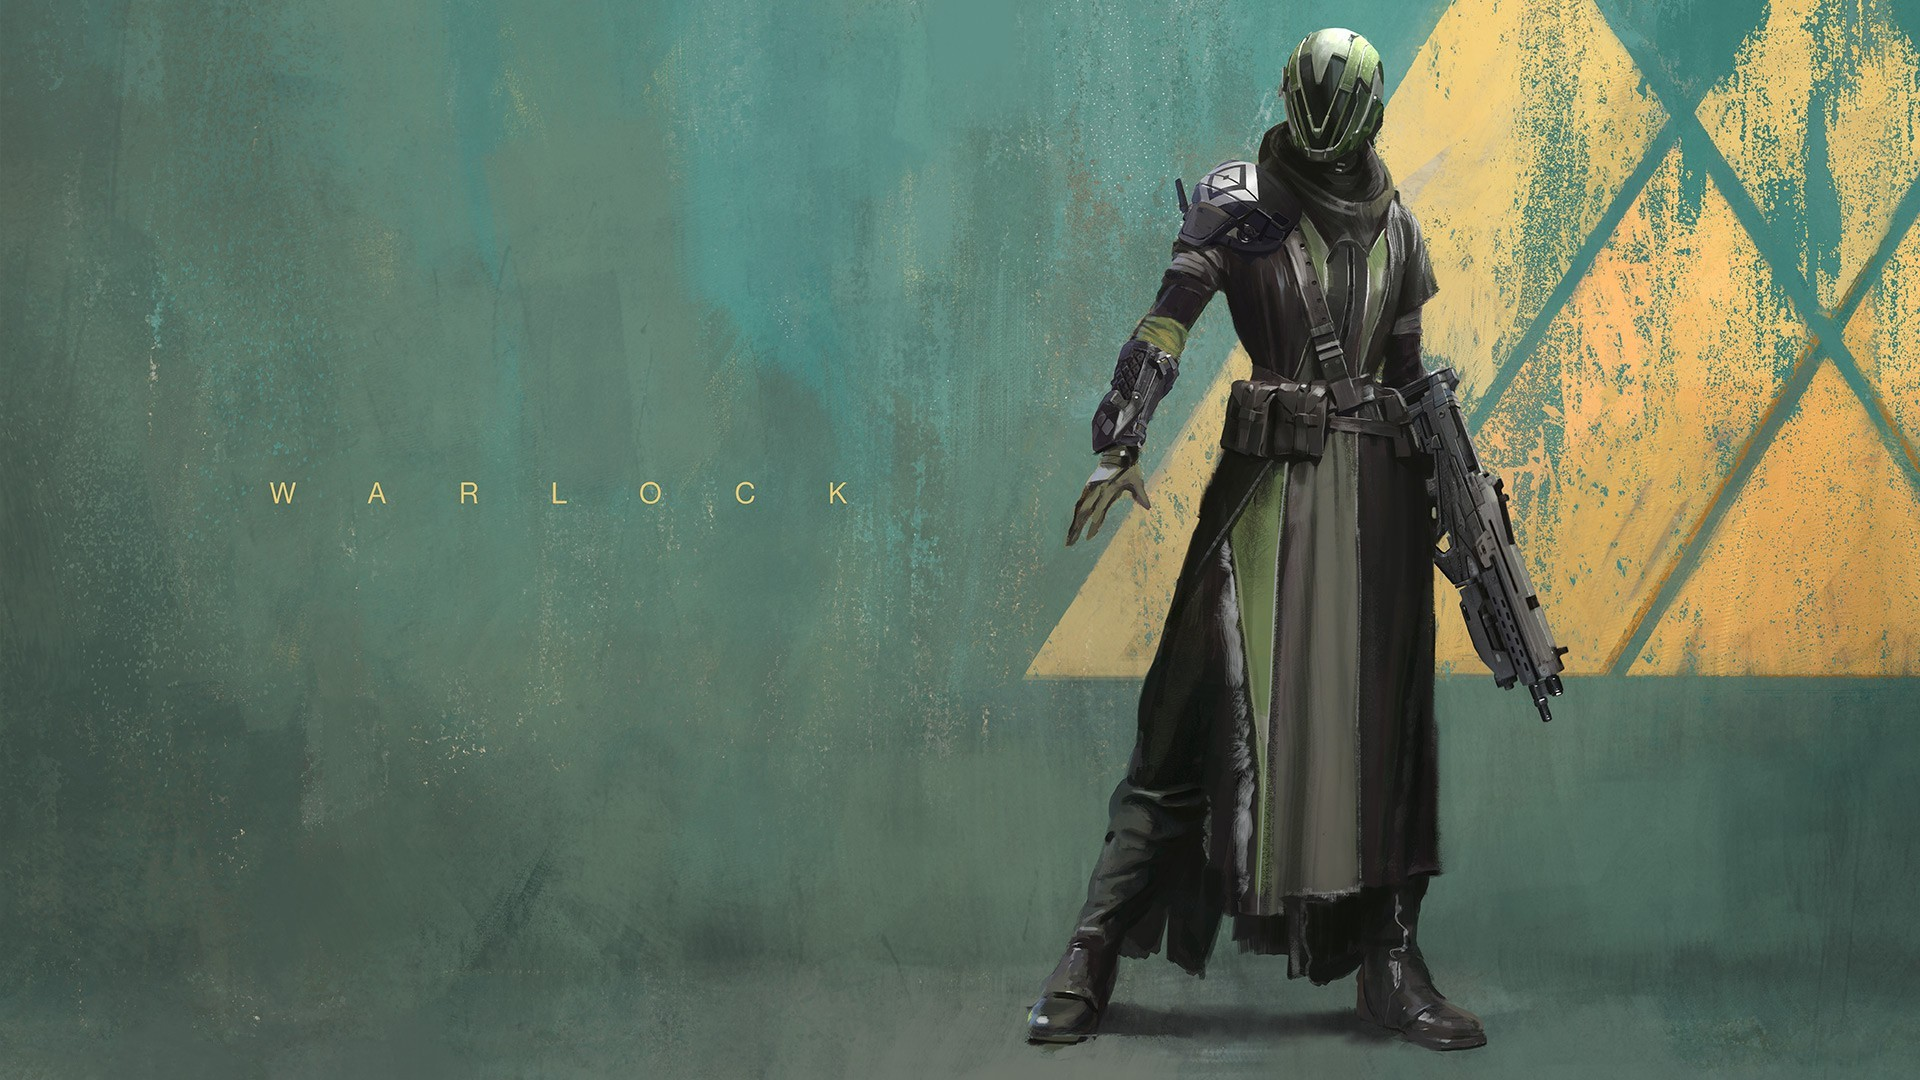 warlock hd wallpaper | background image | 1920x1080 | id:414217